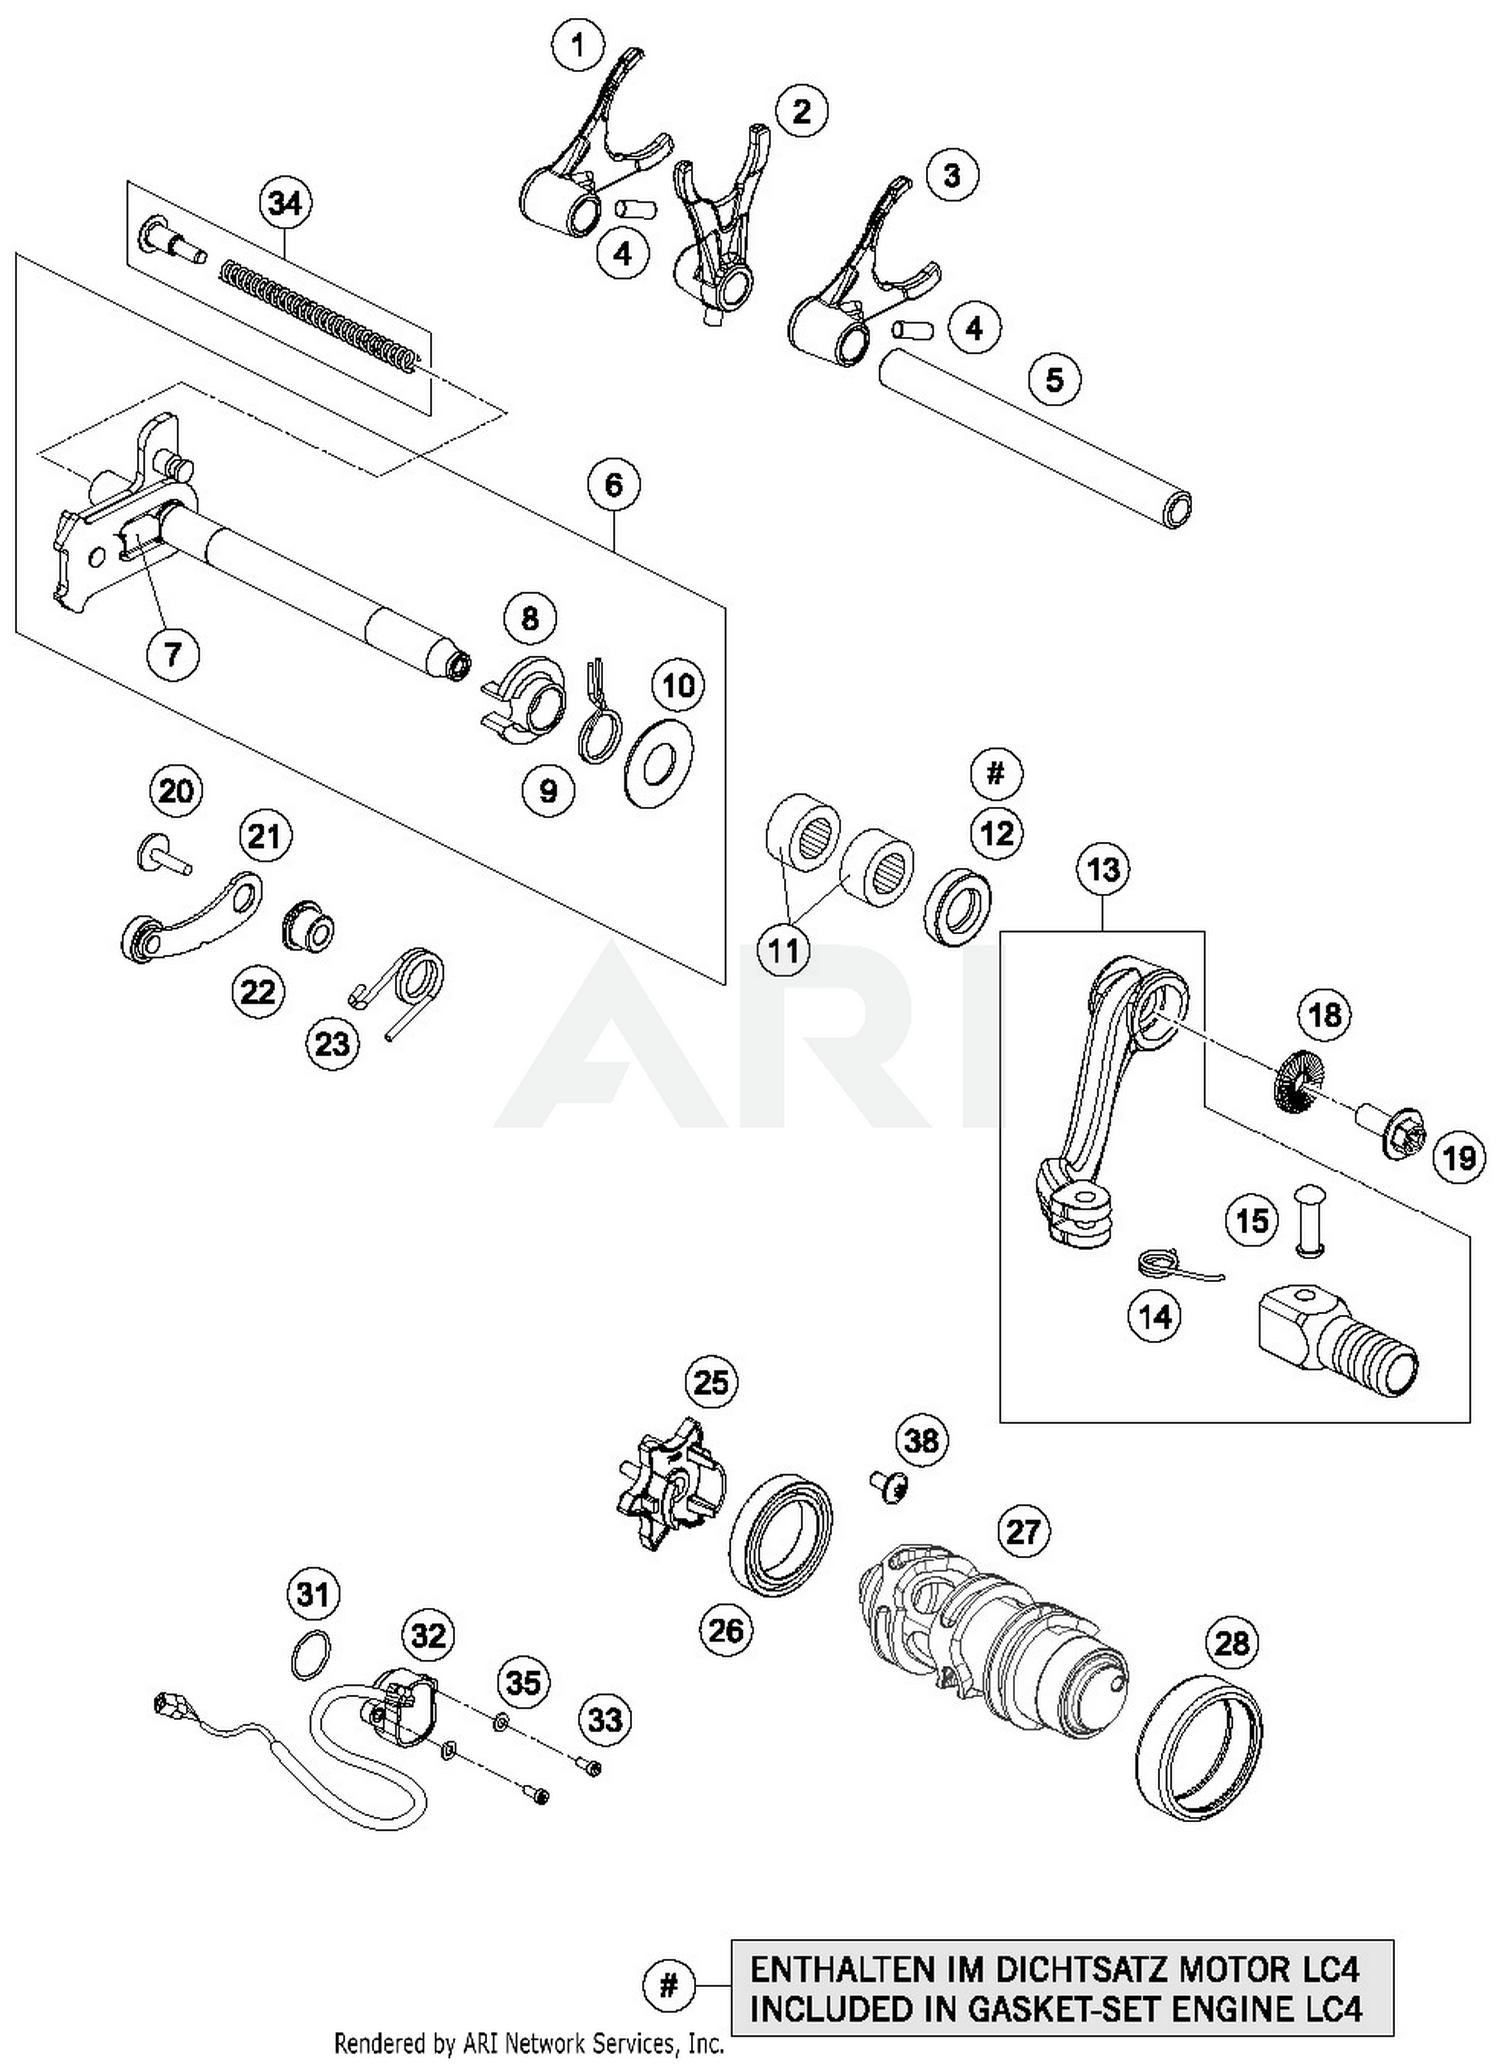 hight resolution of 2018 ktm 690 enduro r abs shifting mechanism parts best oem ktm 690 enduro parts list ktm 690 parts diagram